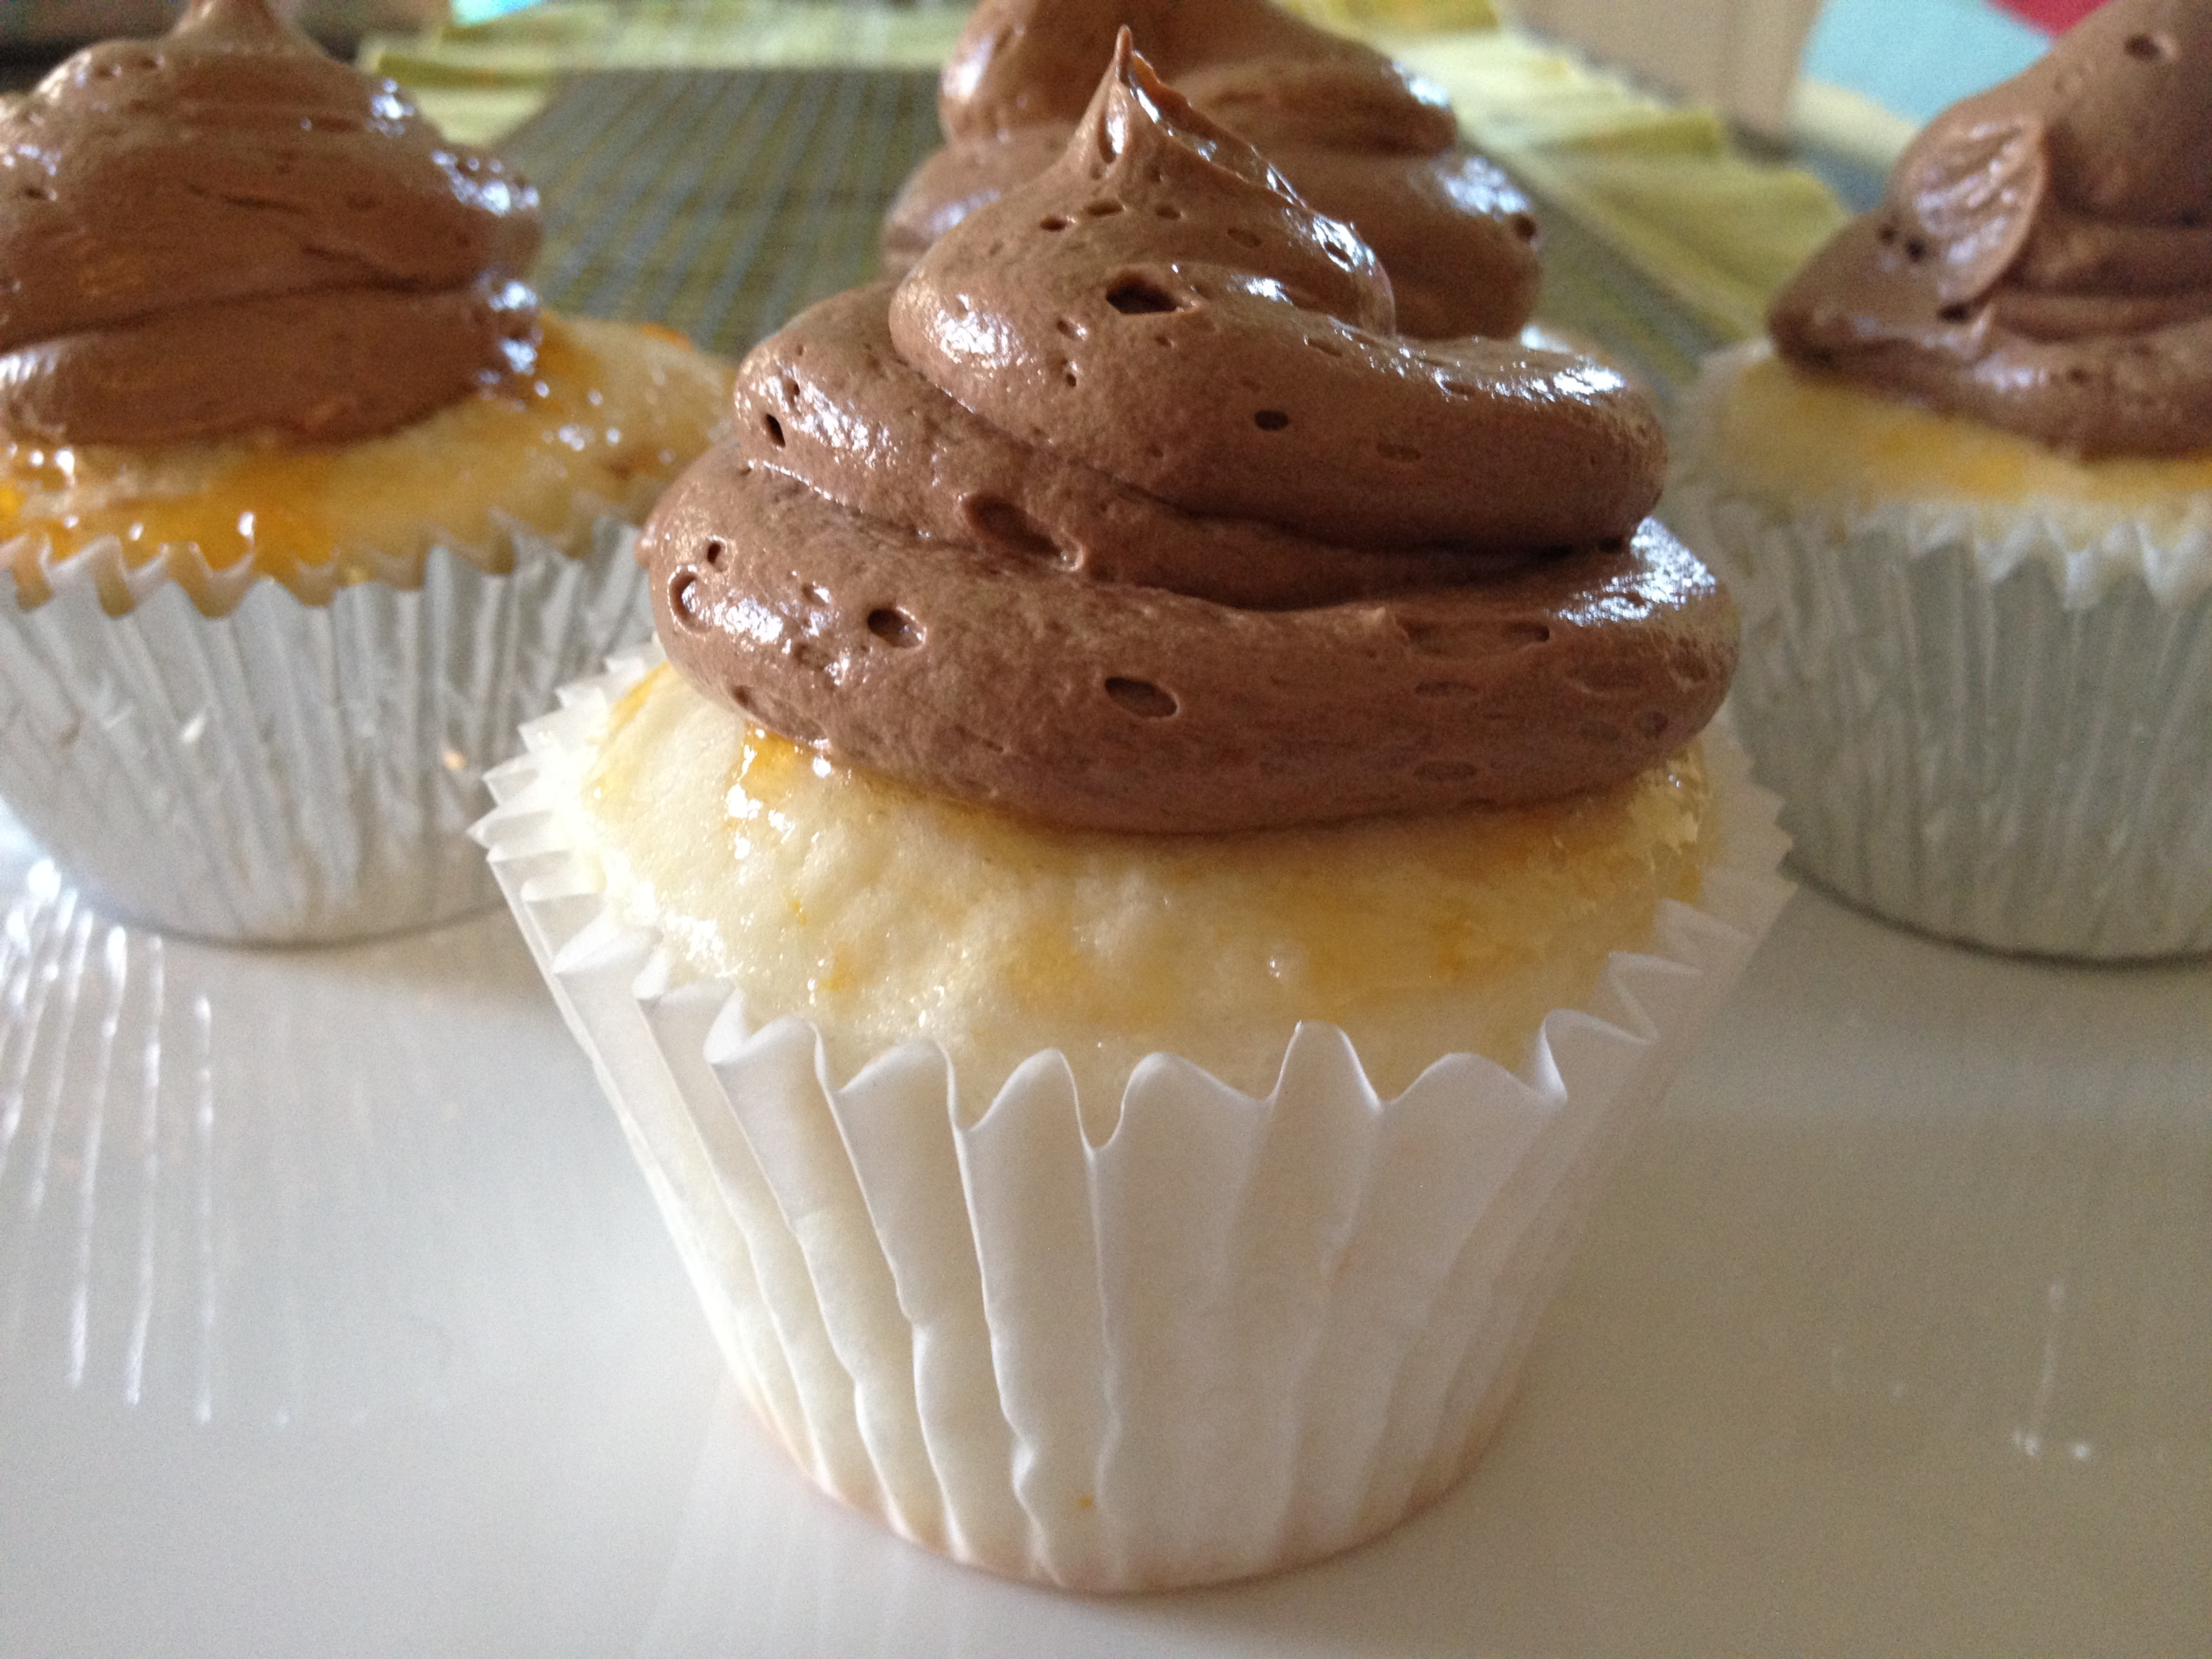 Orange Angel Food Cupcakes With Chocolate Orange Buttercream For ...